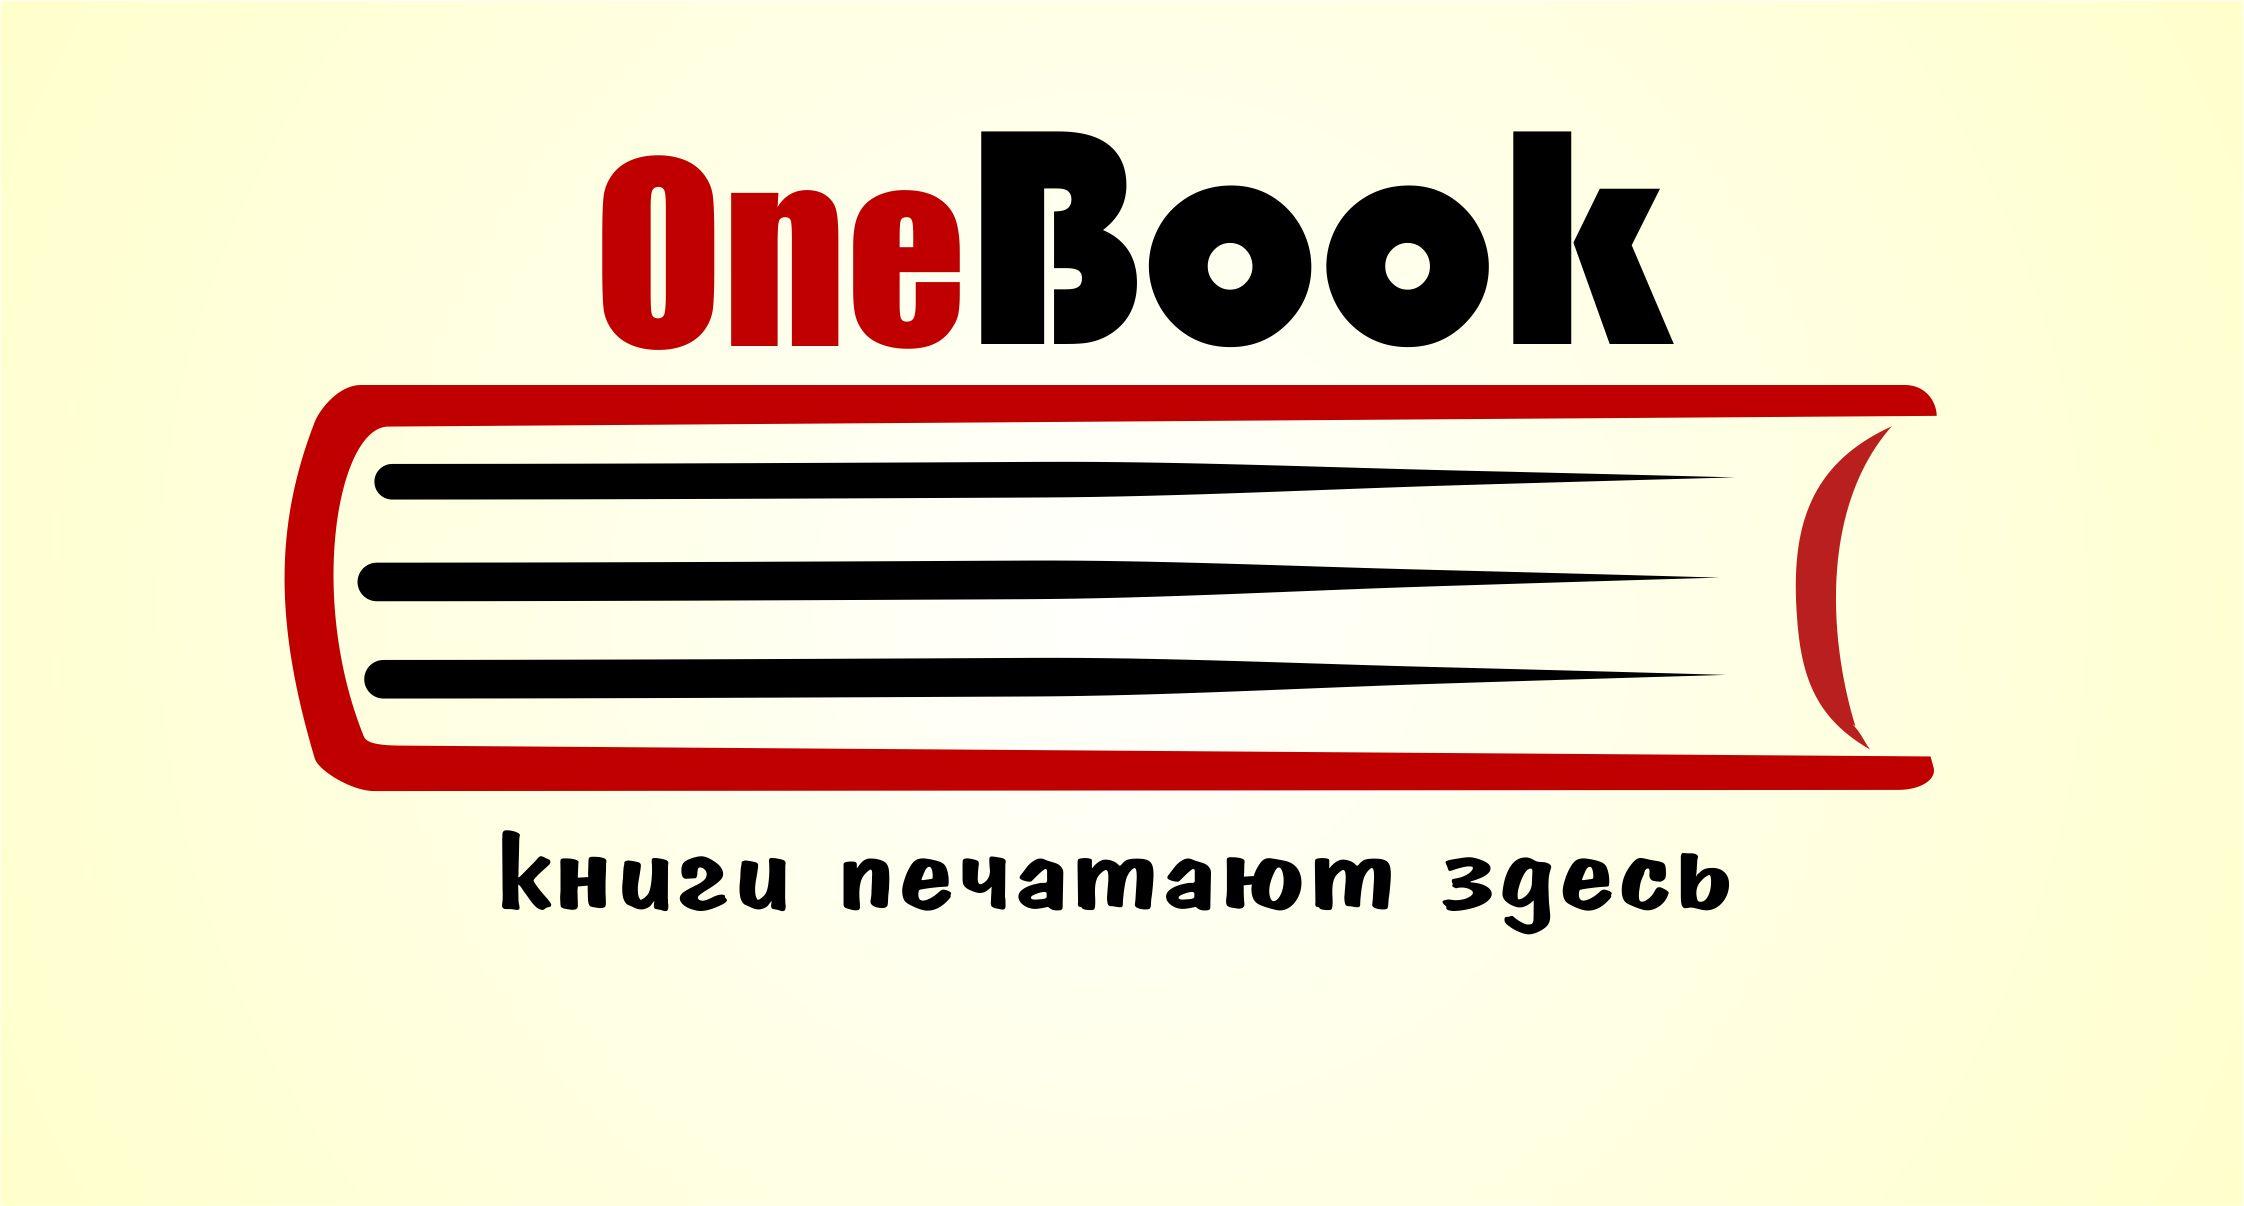 Логотип для цифровой книжной типографии. фото f_4cc05e5ff2b3c.jpg